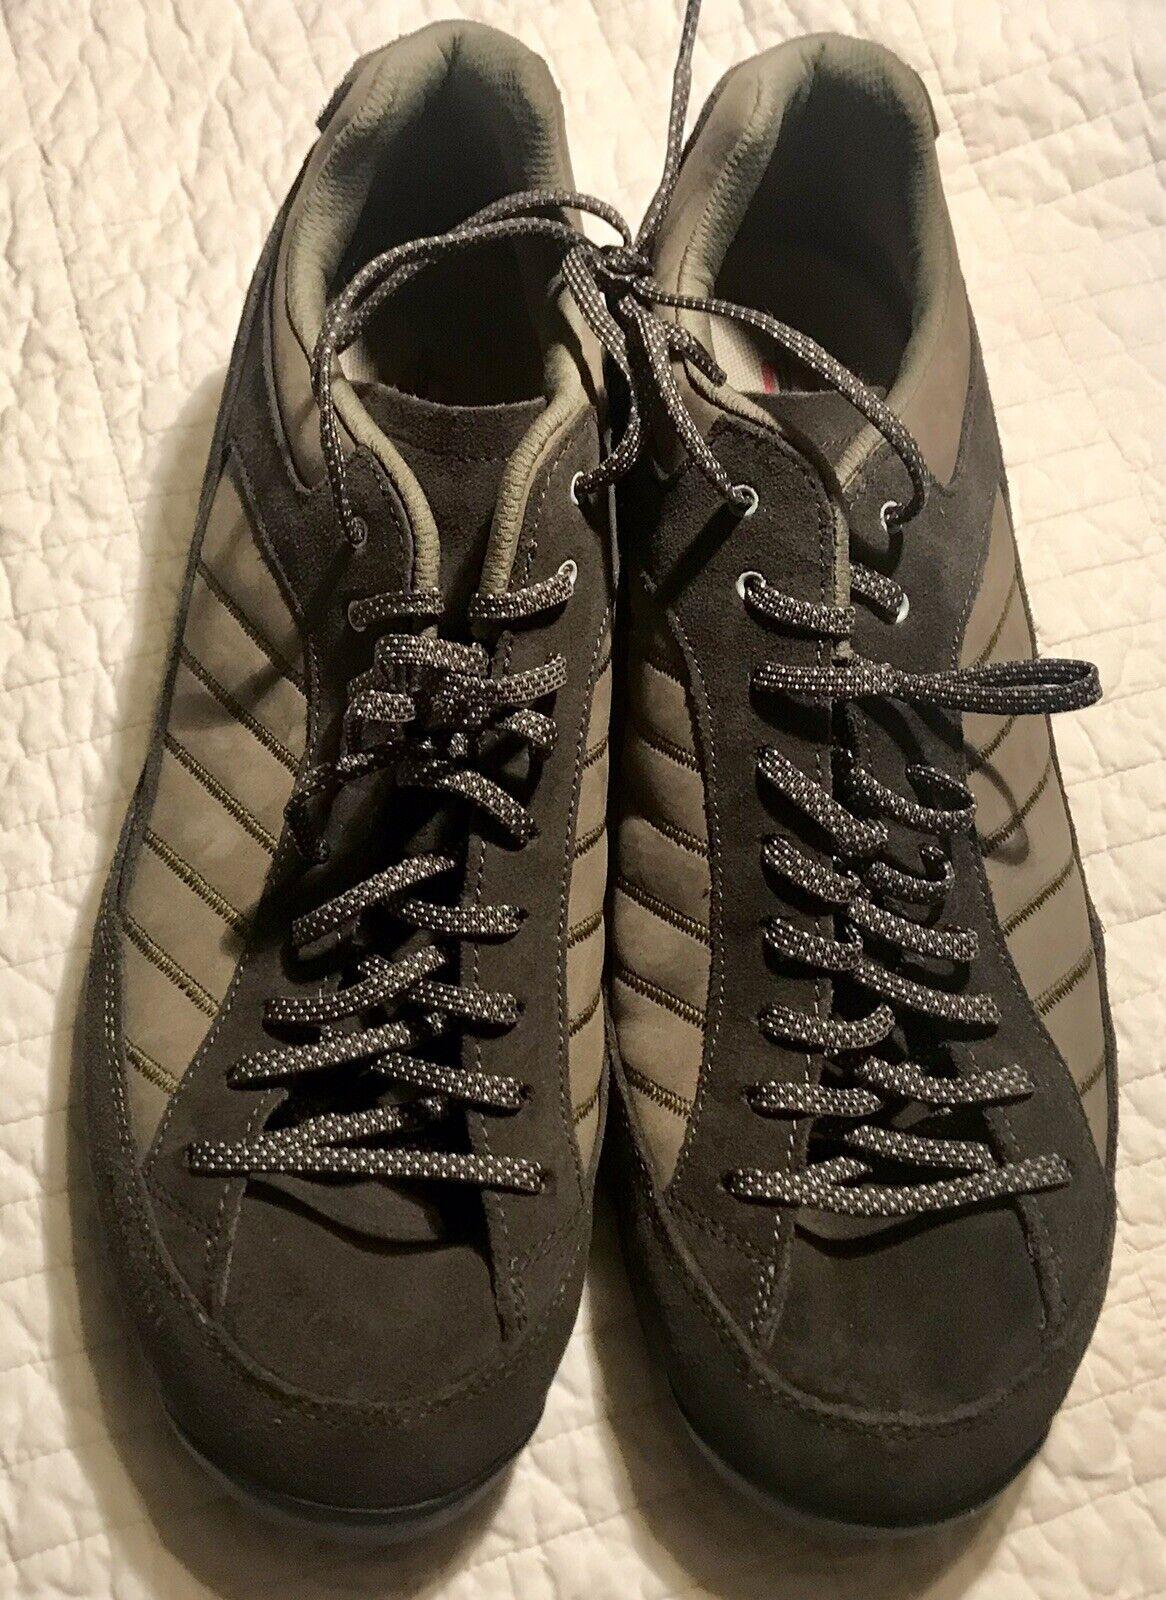 NWOB Garmont Men's Low-rise Suede Vibram Sole Hiking shoes- 13